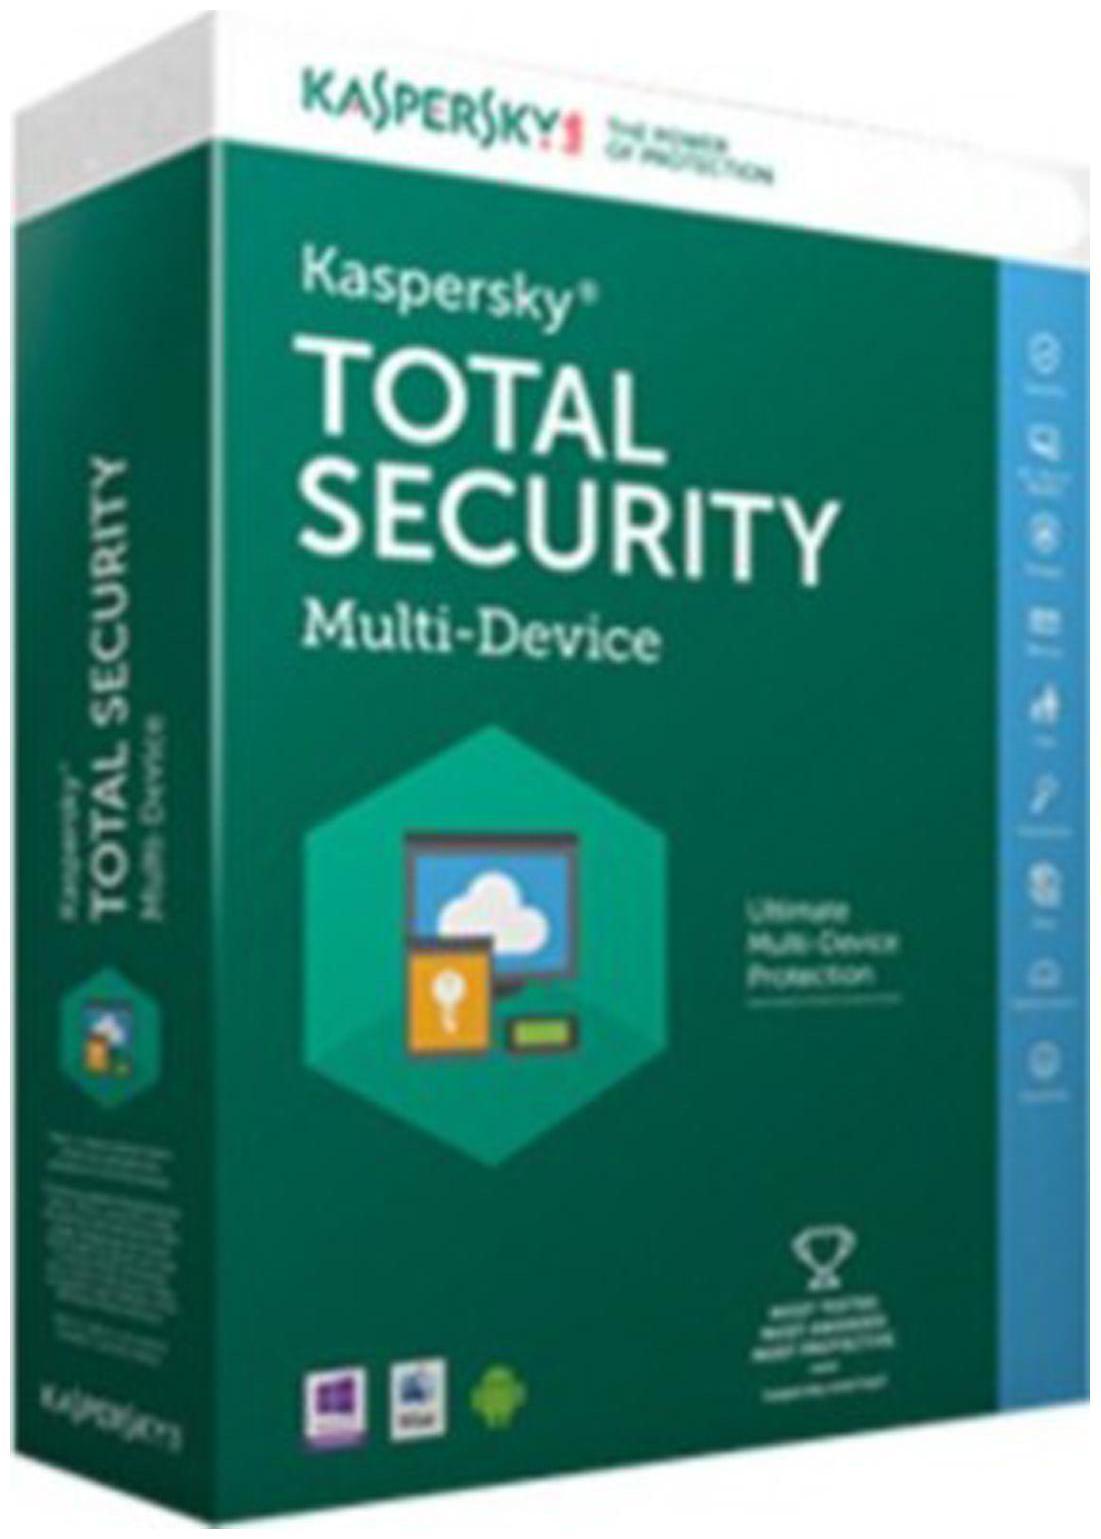 https://assetscdn1.paytm.com/images/catalog/product/C/CO/COMKASPERSKY-TOORAN666402A736773E/1562675180434_0.jpeg